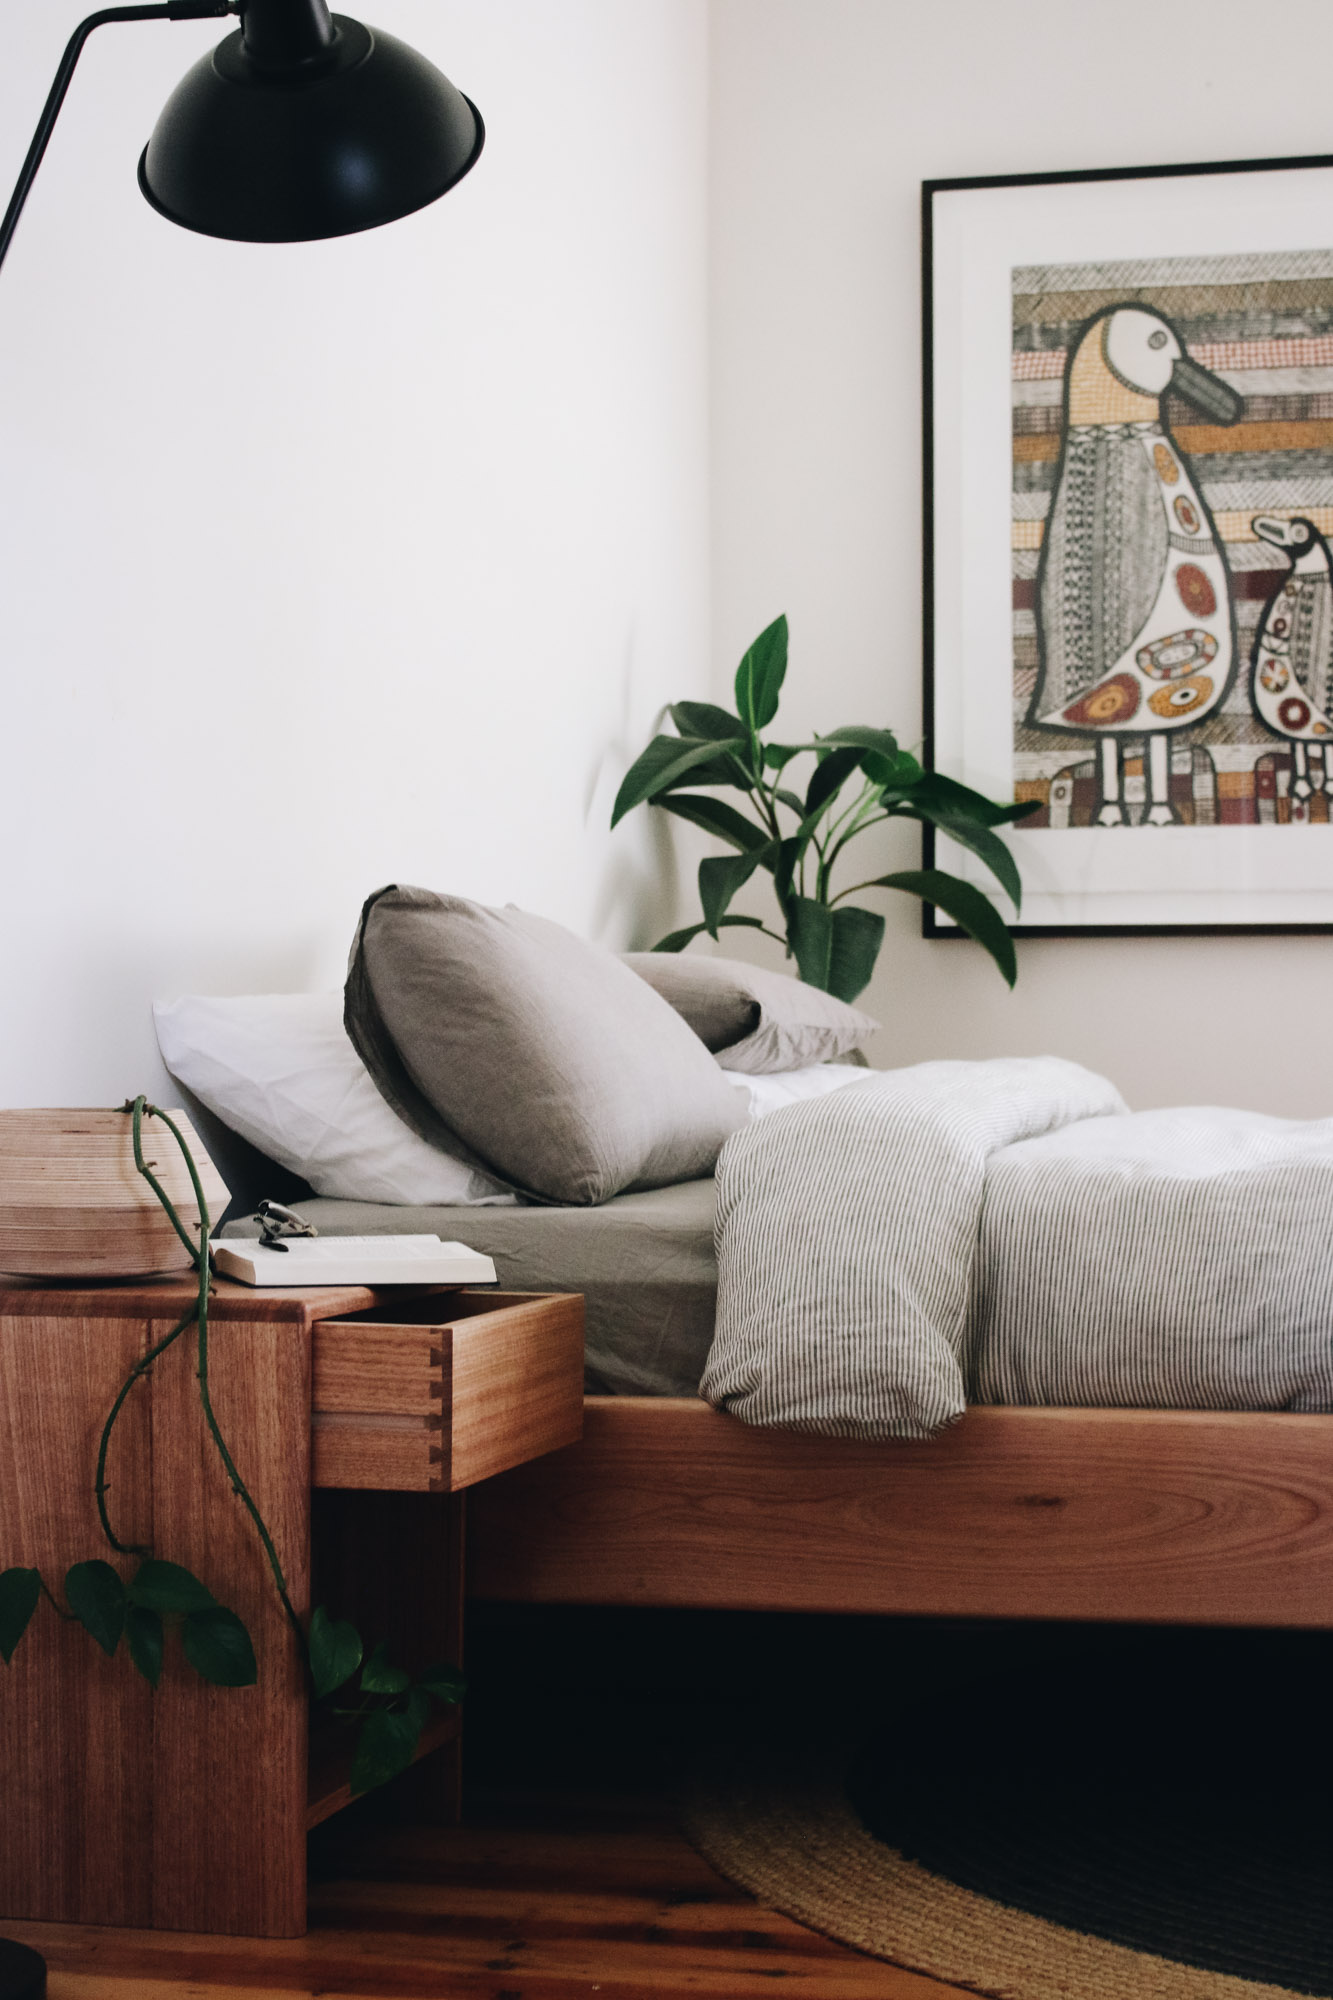 al-and-imo-handmade-simple-minimalist-low-timber-bed-frame-custom-australia-melbourne-28.jpg